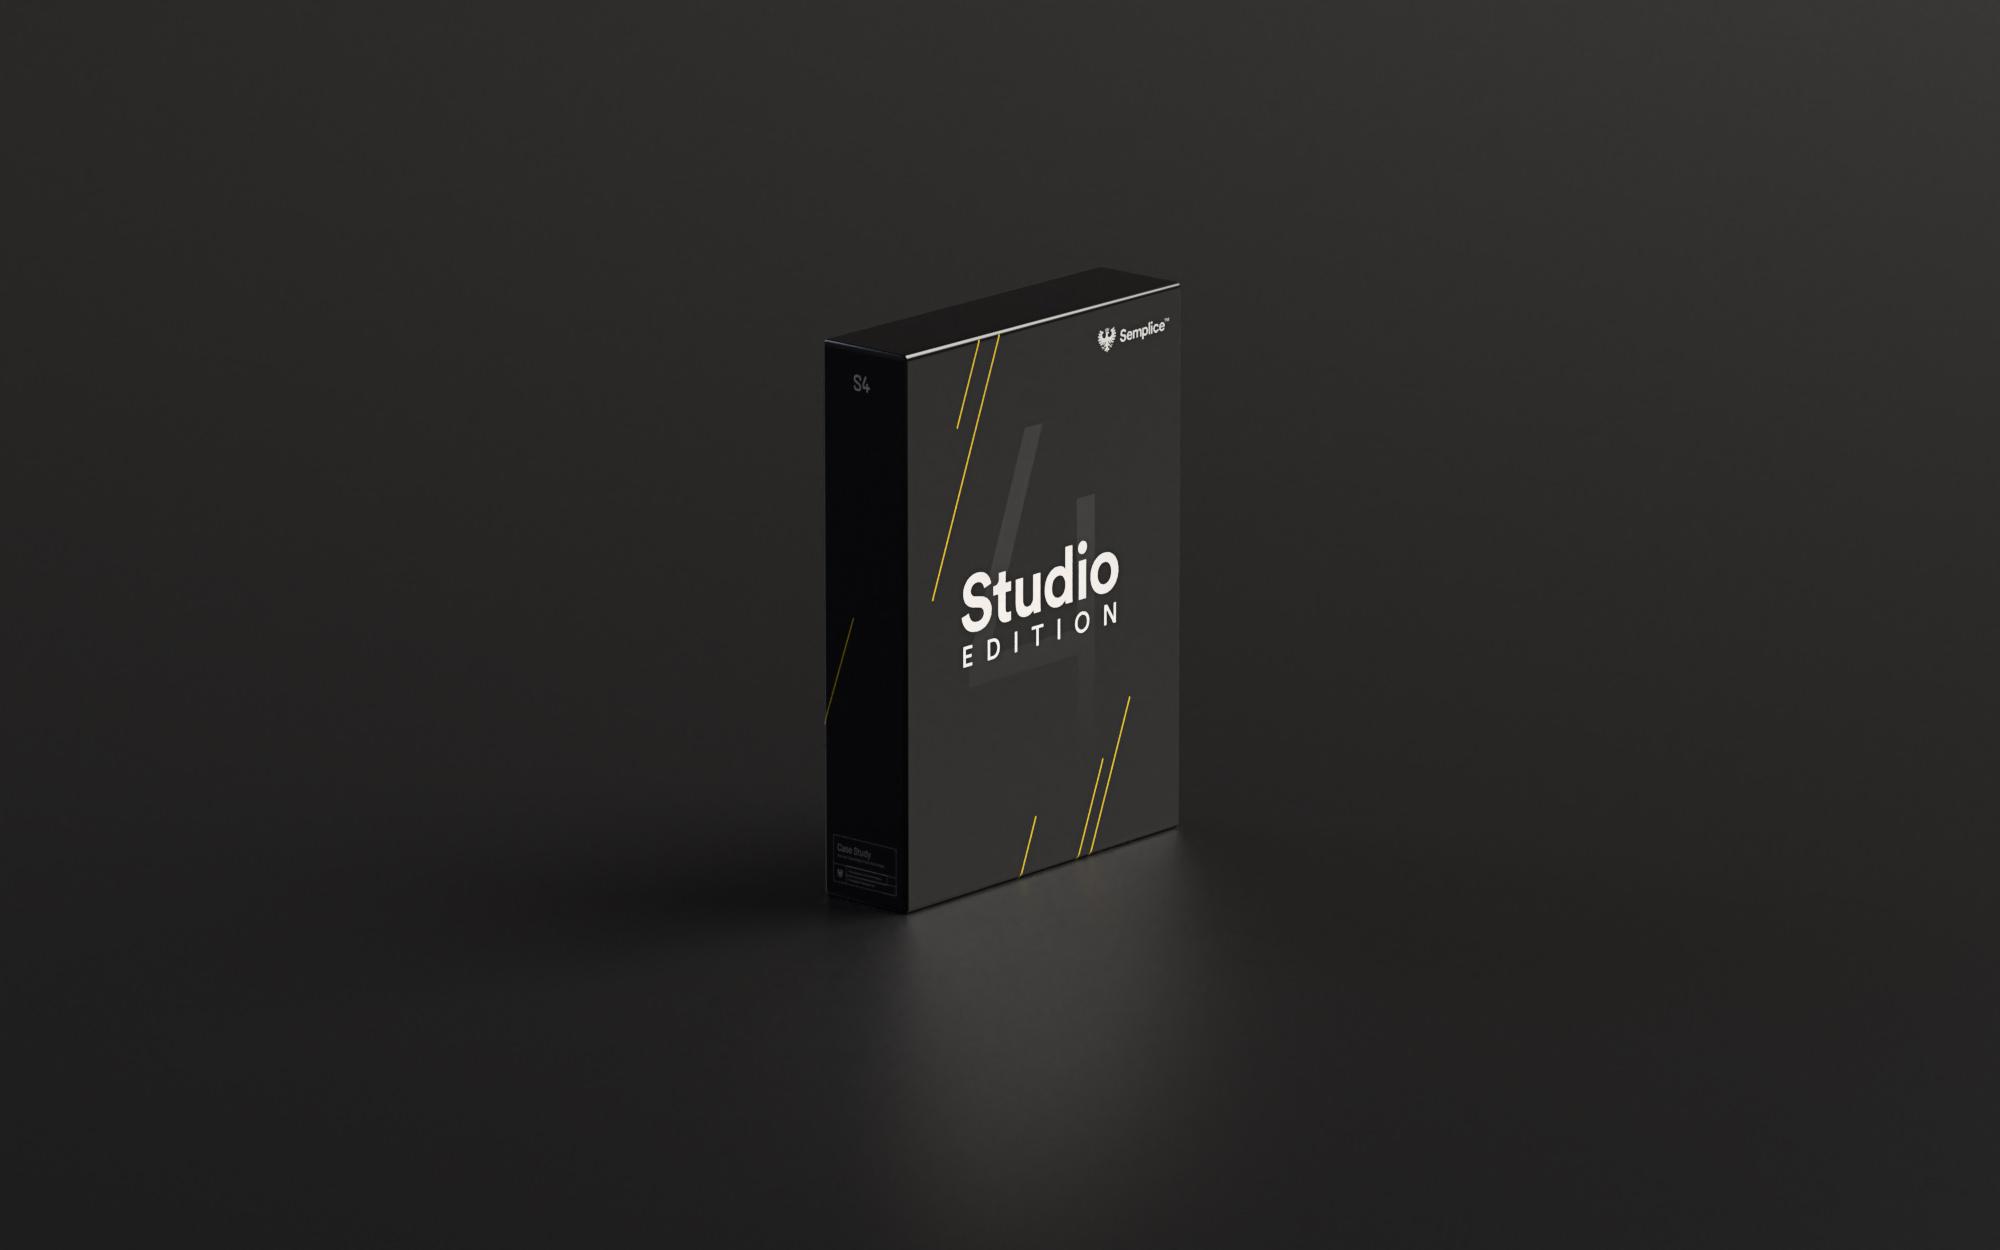 Rendered image of Semplice Studio box art using Adobe Dimension